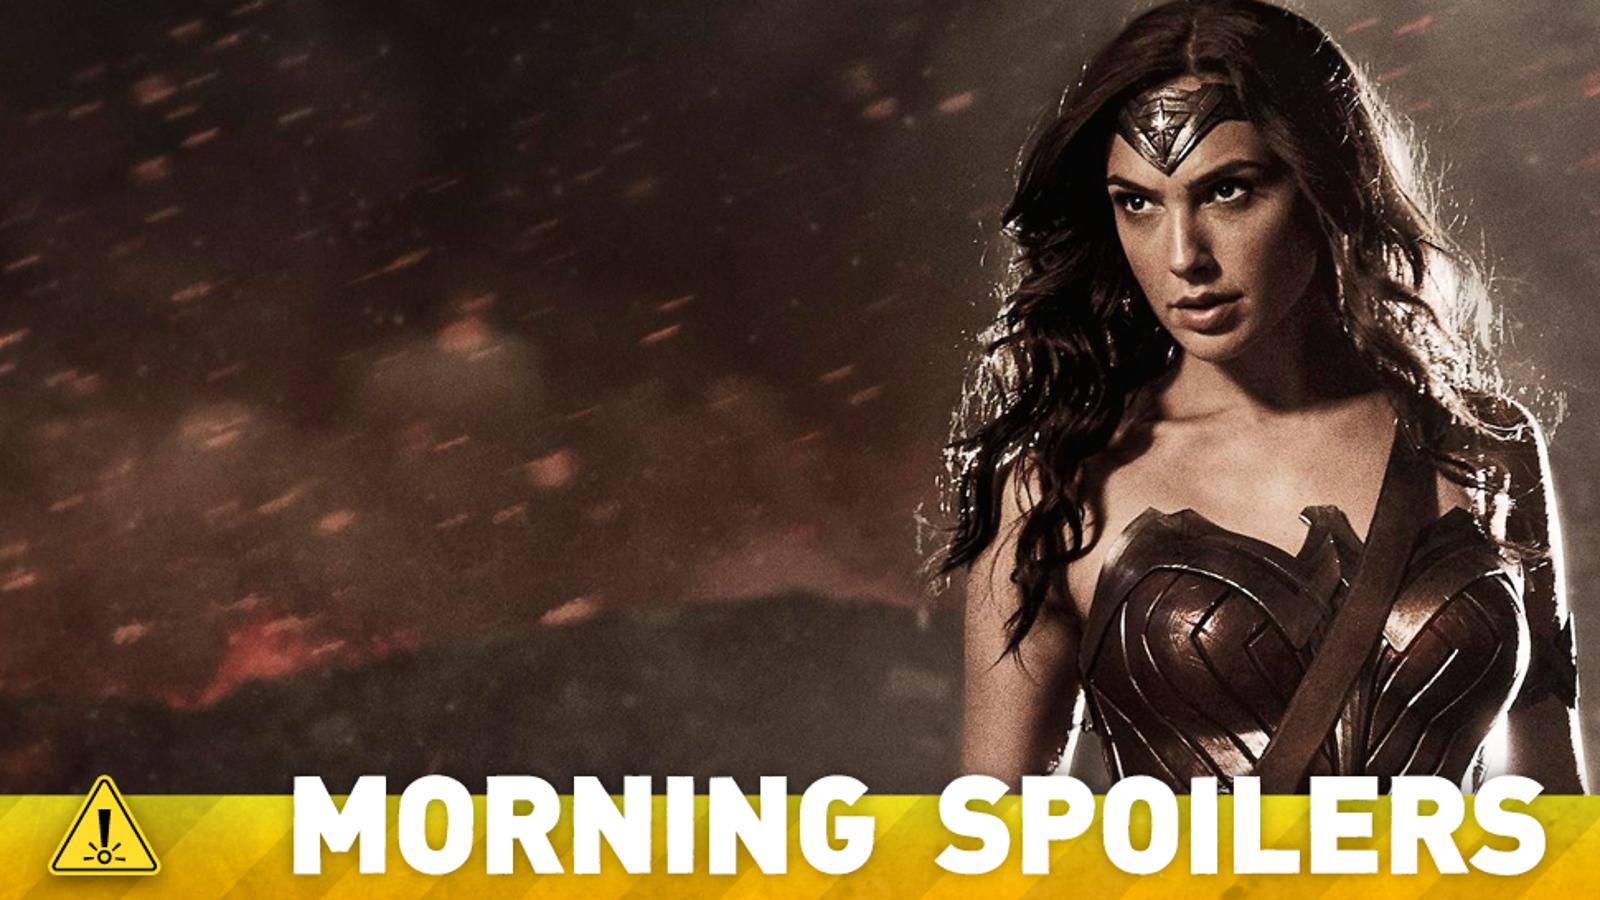 Are You Ready To Watch Star Trek's Chris Pine Romance Wonder Woman?